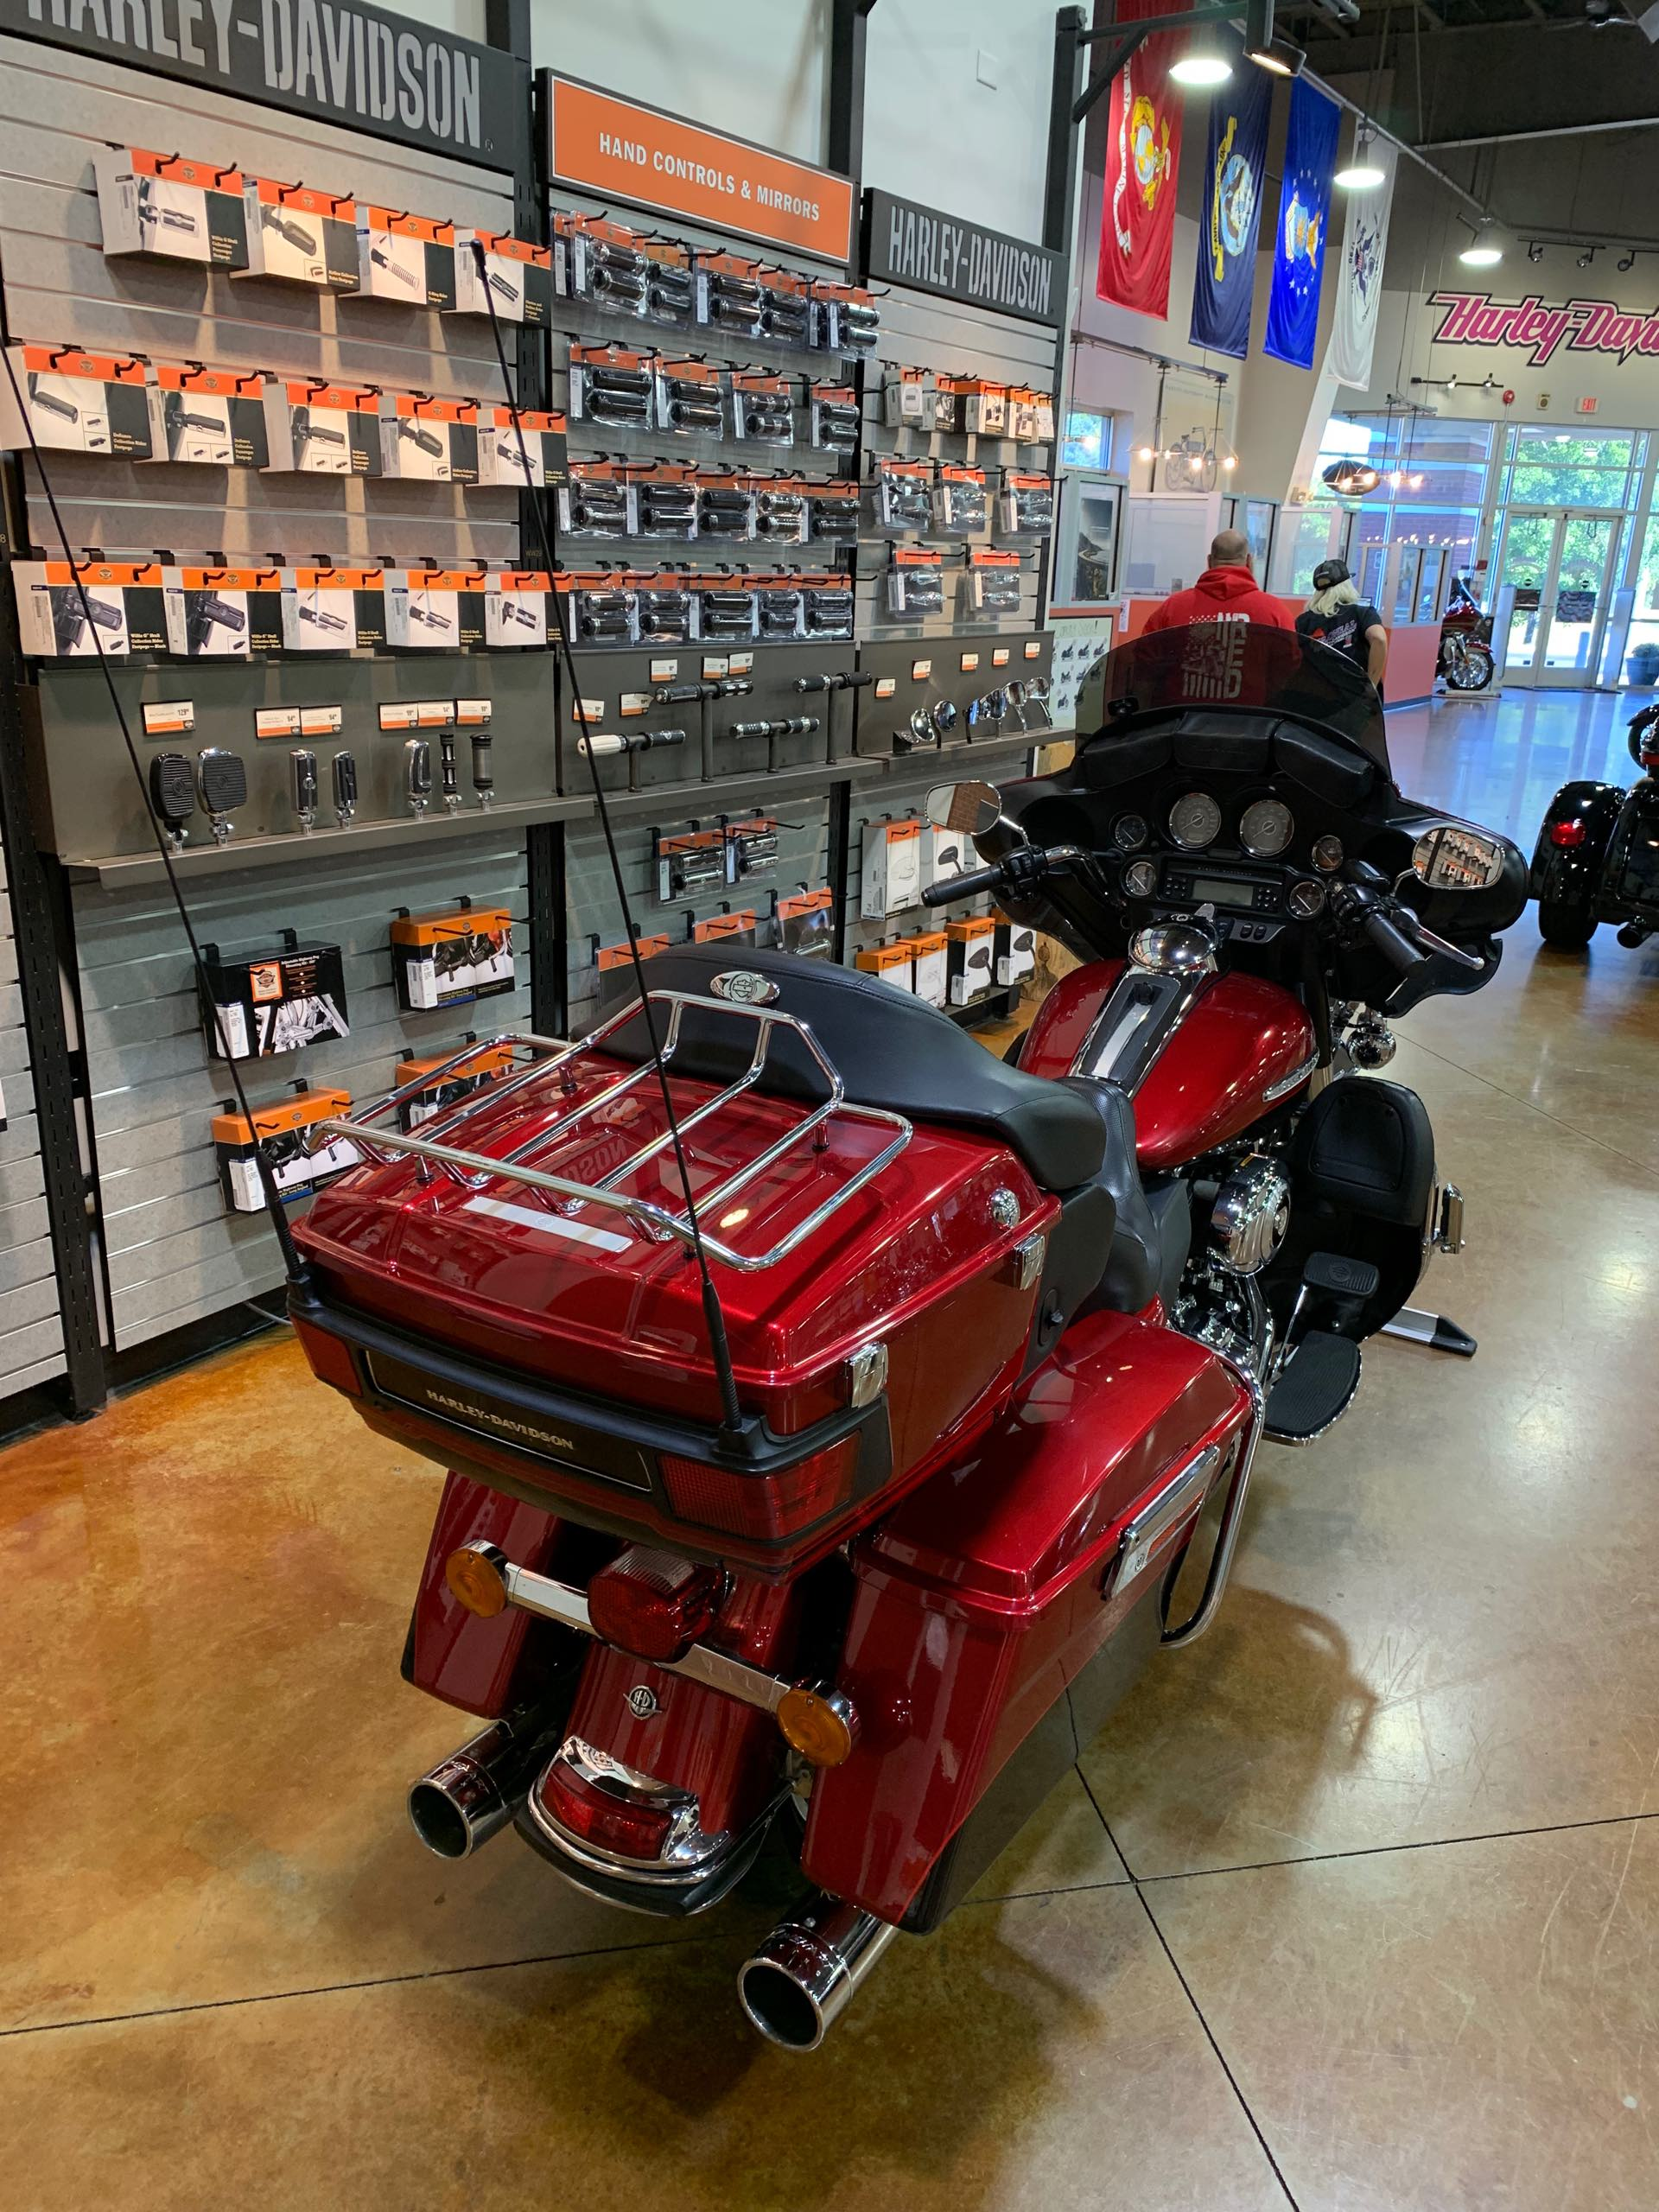 2013 Harley-Davidson Electra Glide Ultra Limited at Colonial Harley-Davidson